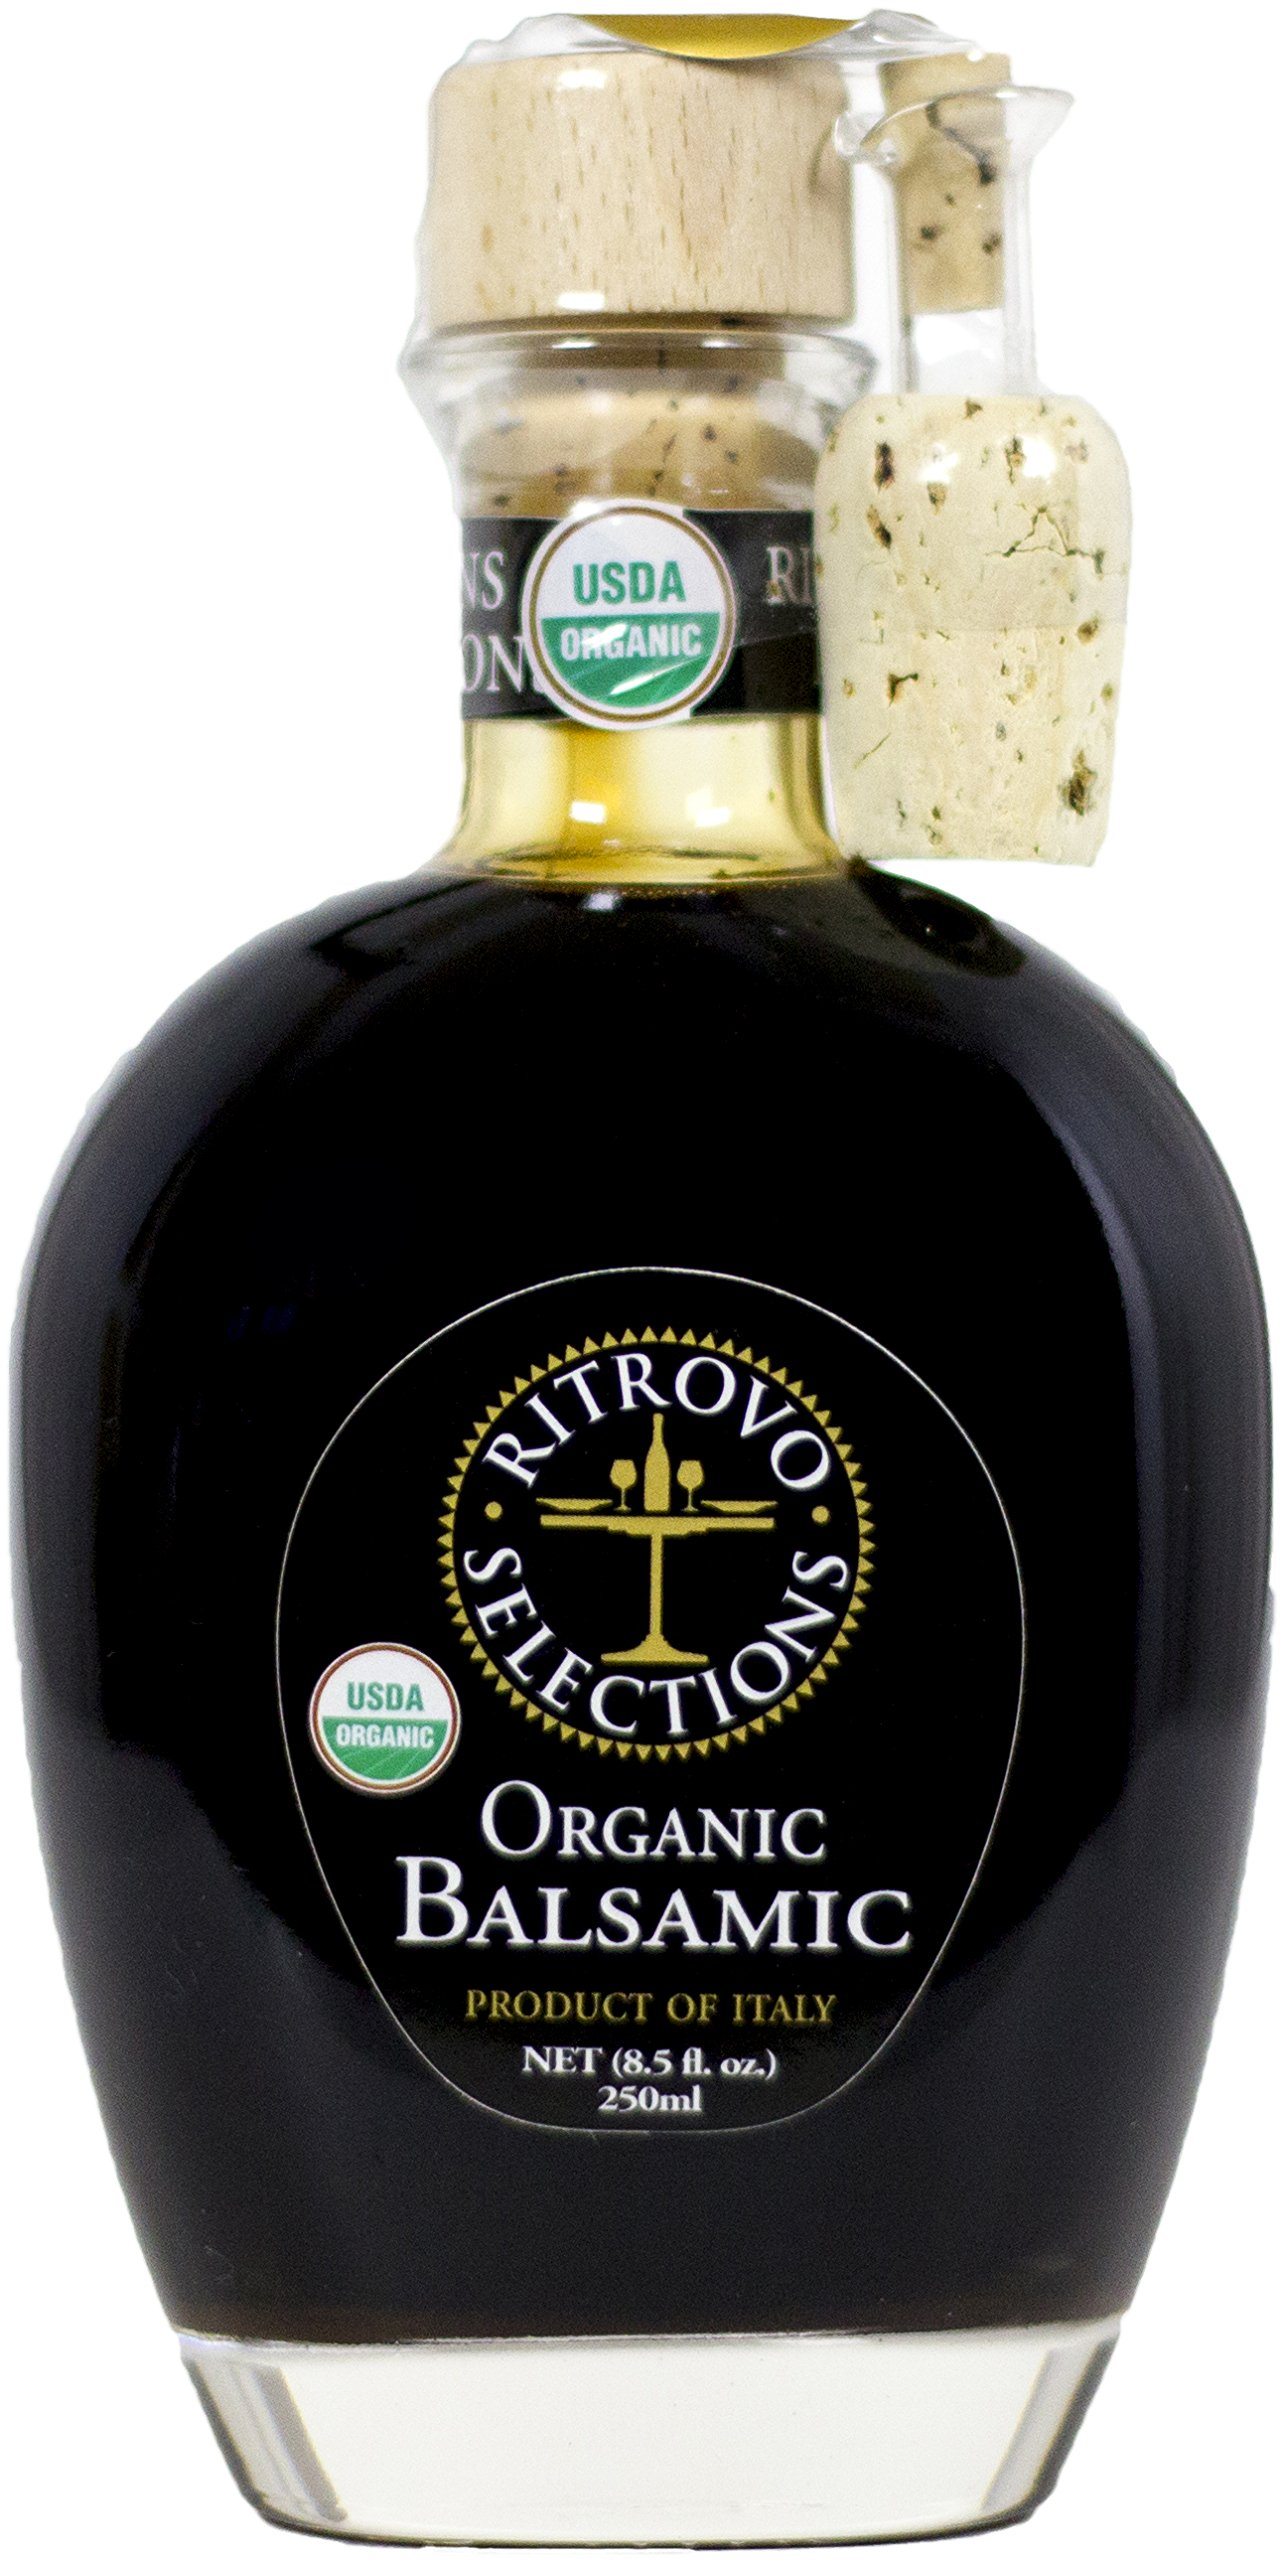 Ritrovo Selections Organic Balsamic - 8.5 fl. oz.